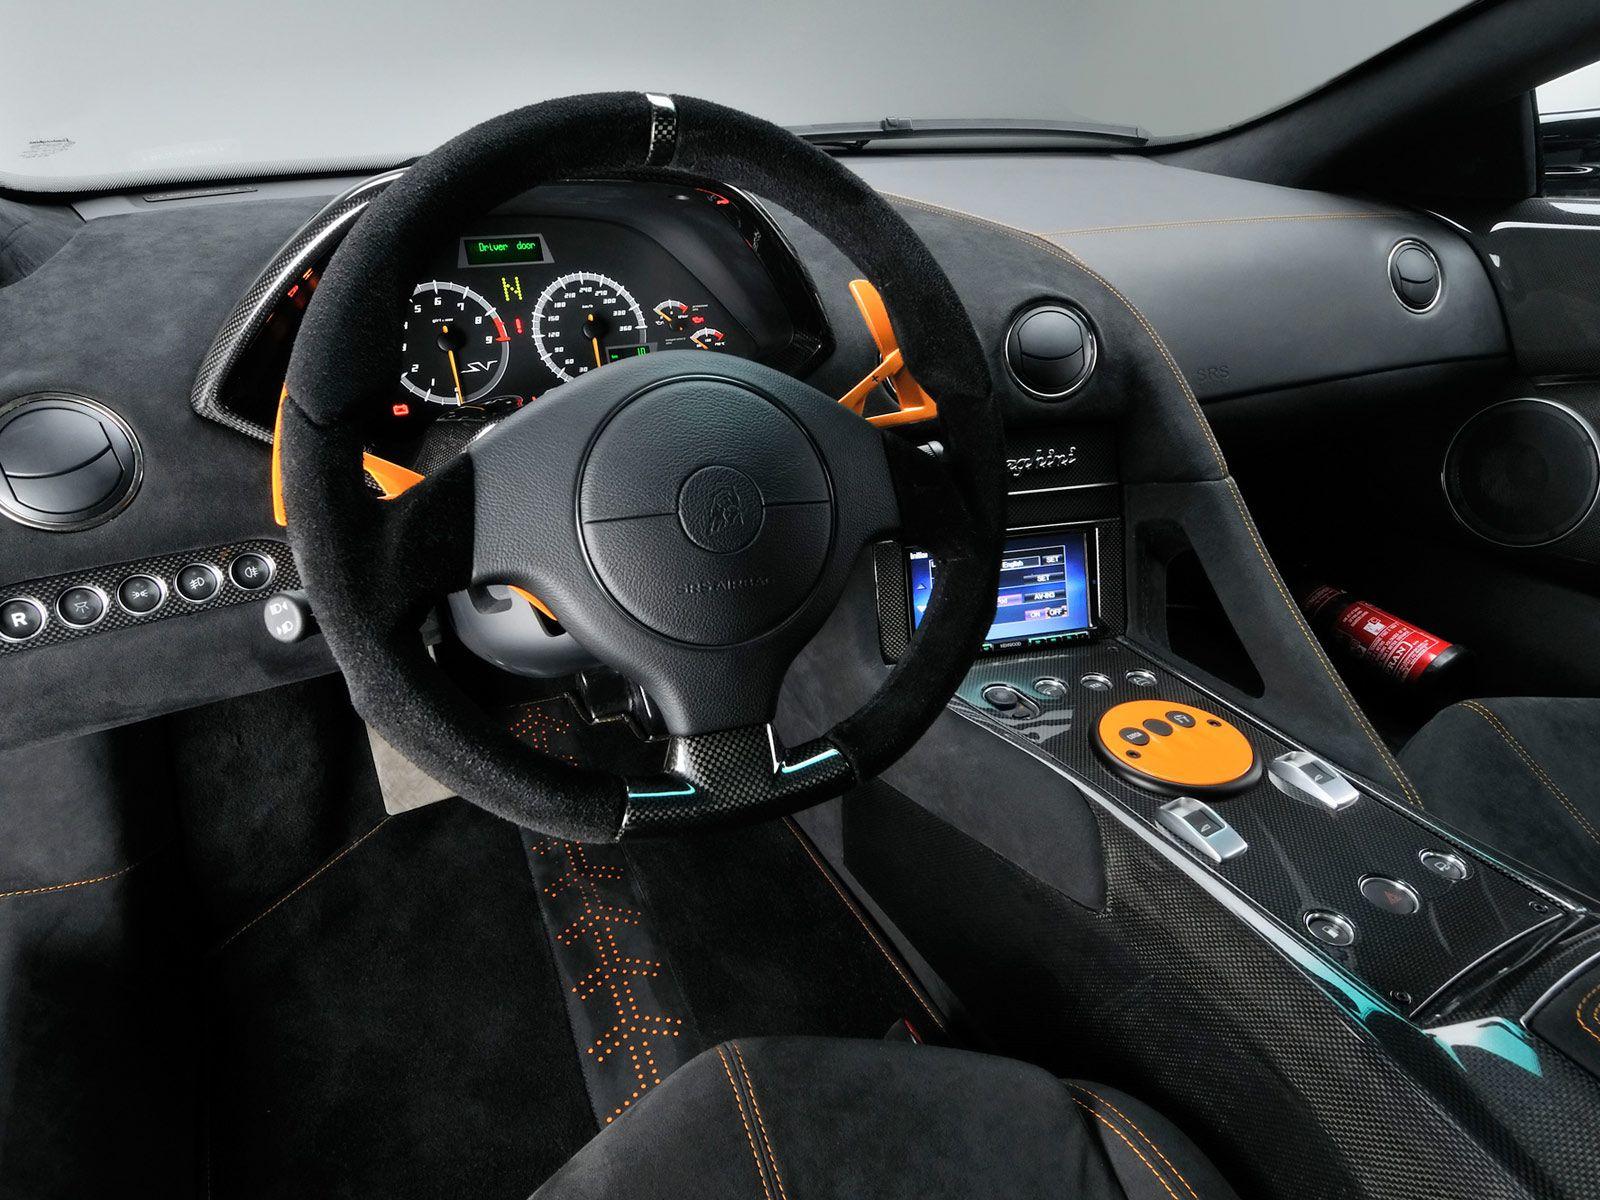 Lamborghini Murcielago Lp670 4 Sv China Edition Interior Cars